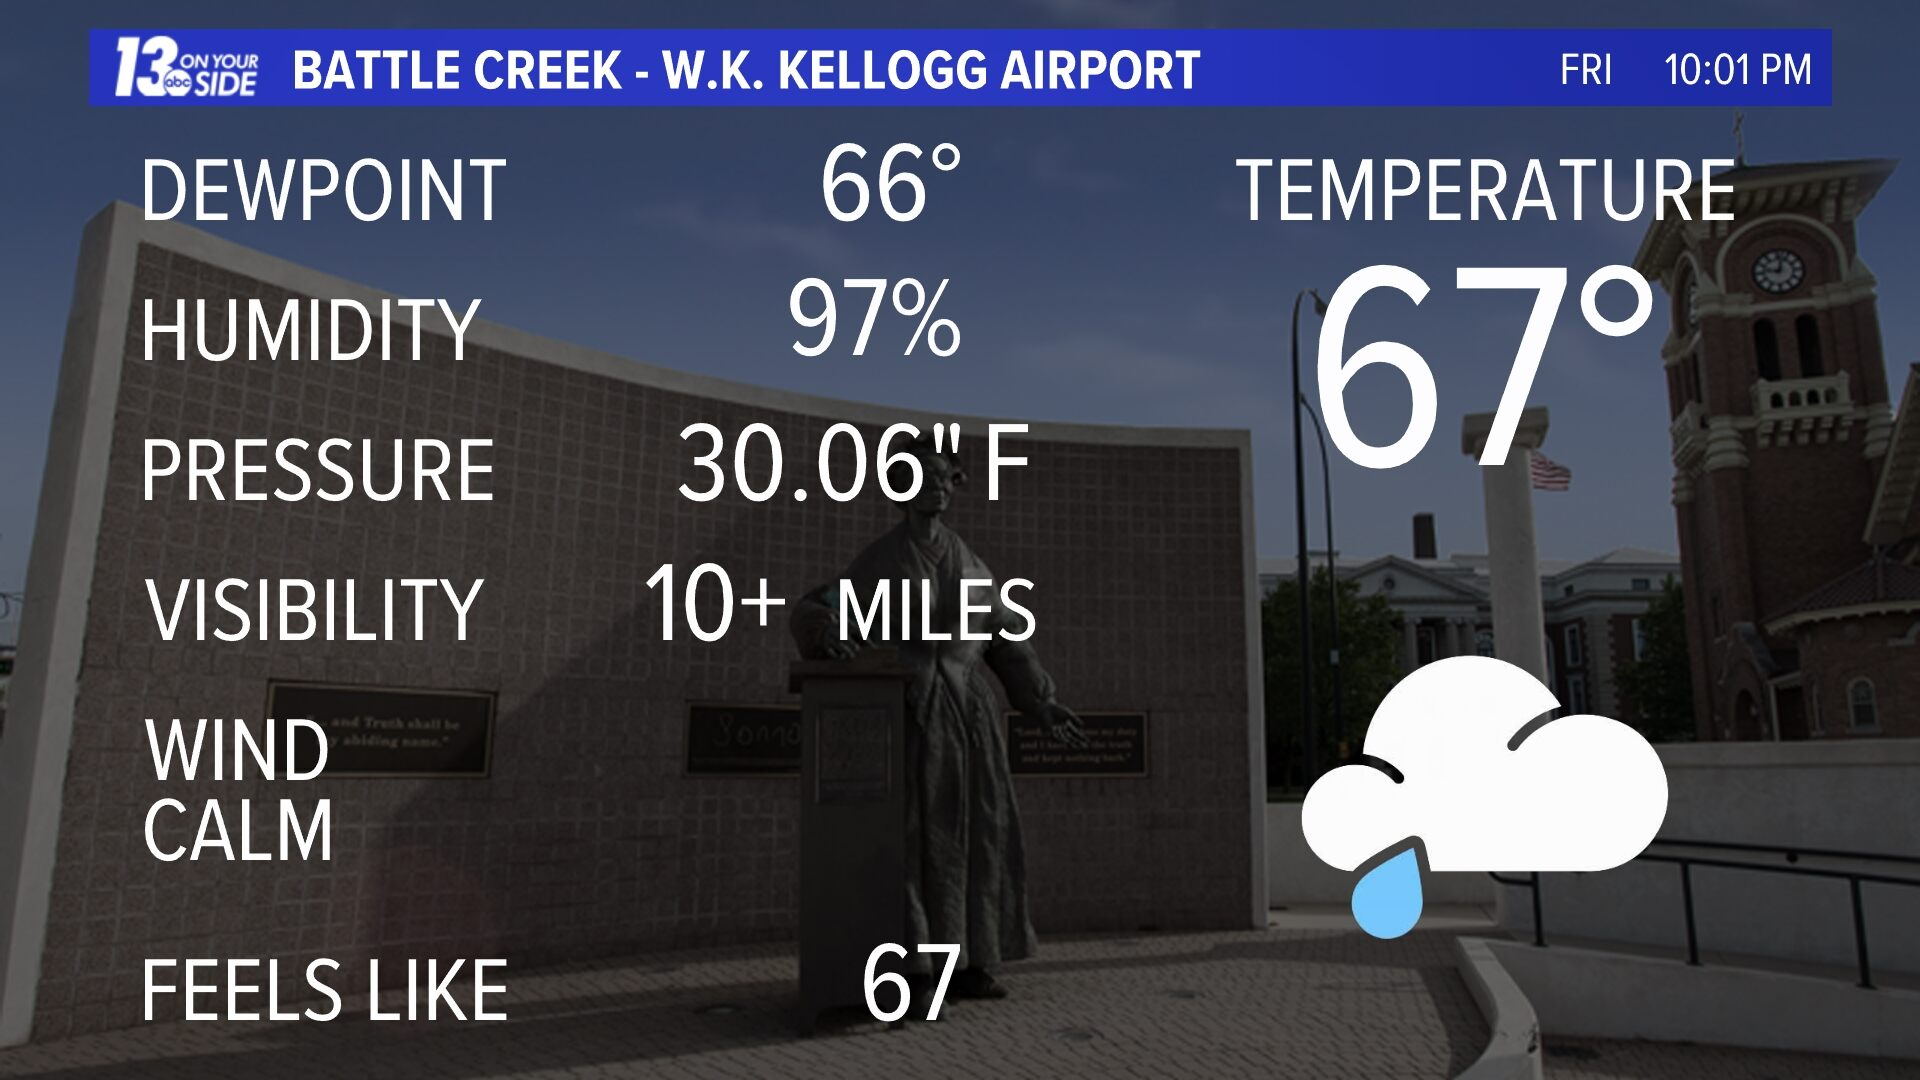 Battle Creek - W.K. Kellogg Airport